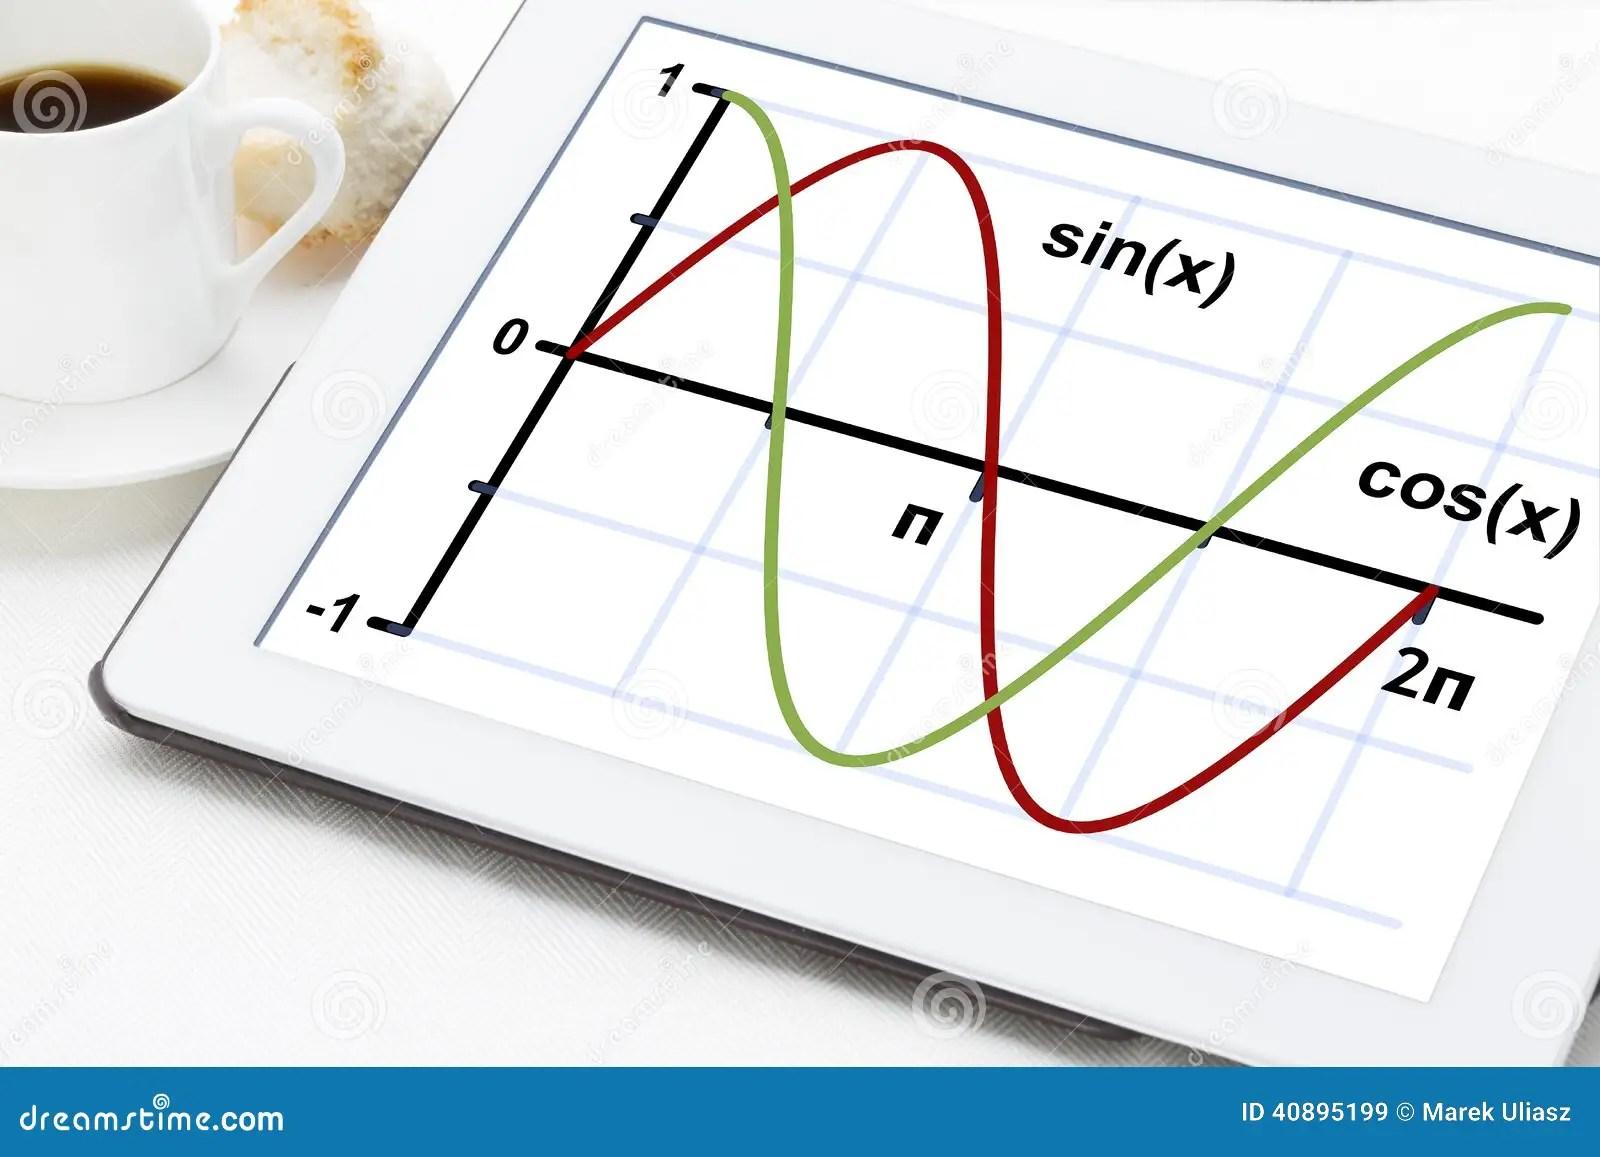 Sine And Cosine Functions Stock Image Image Ofysis